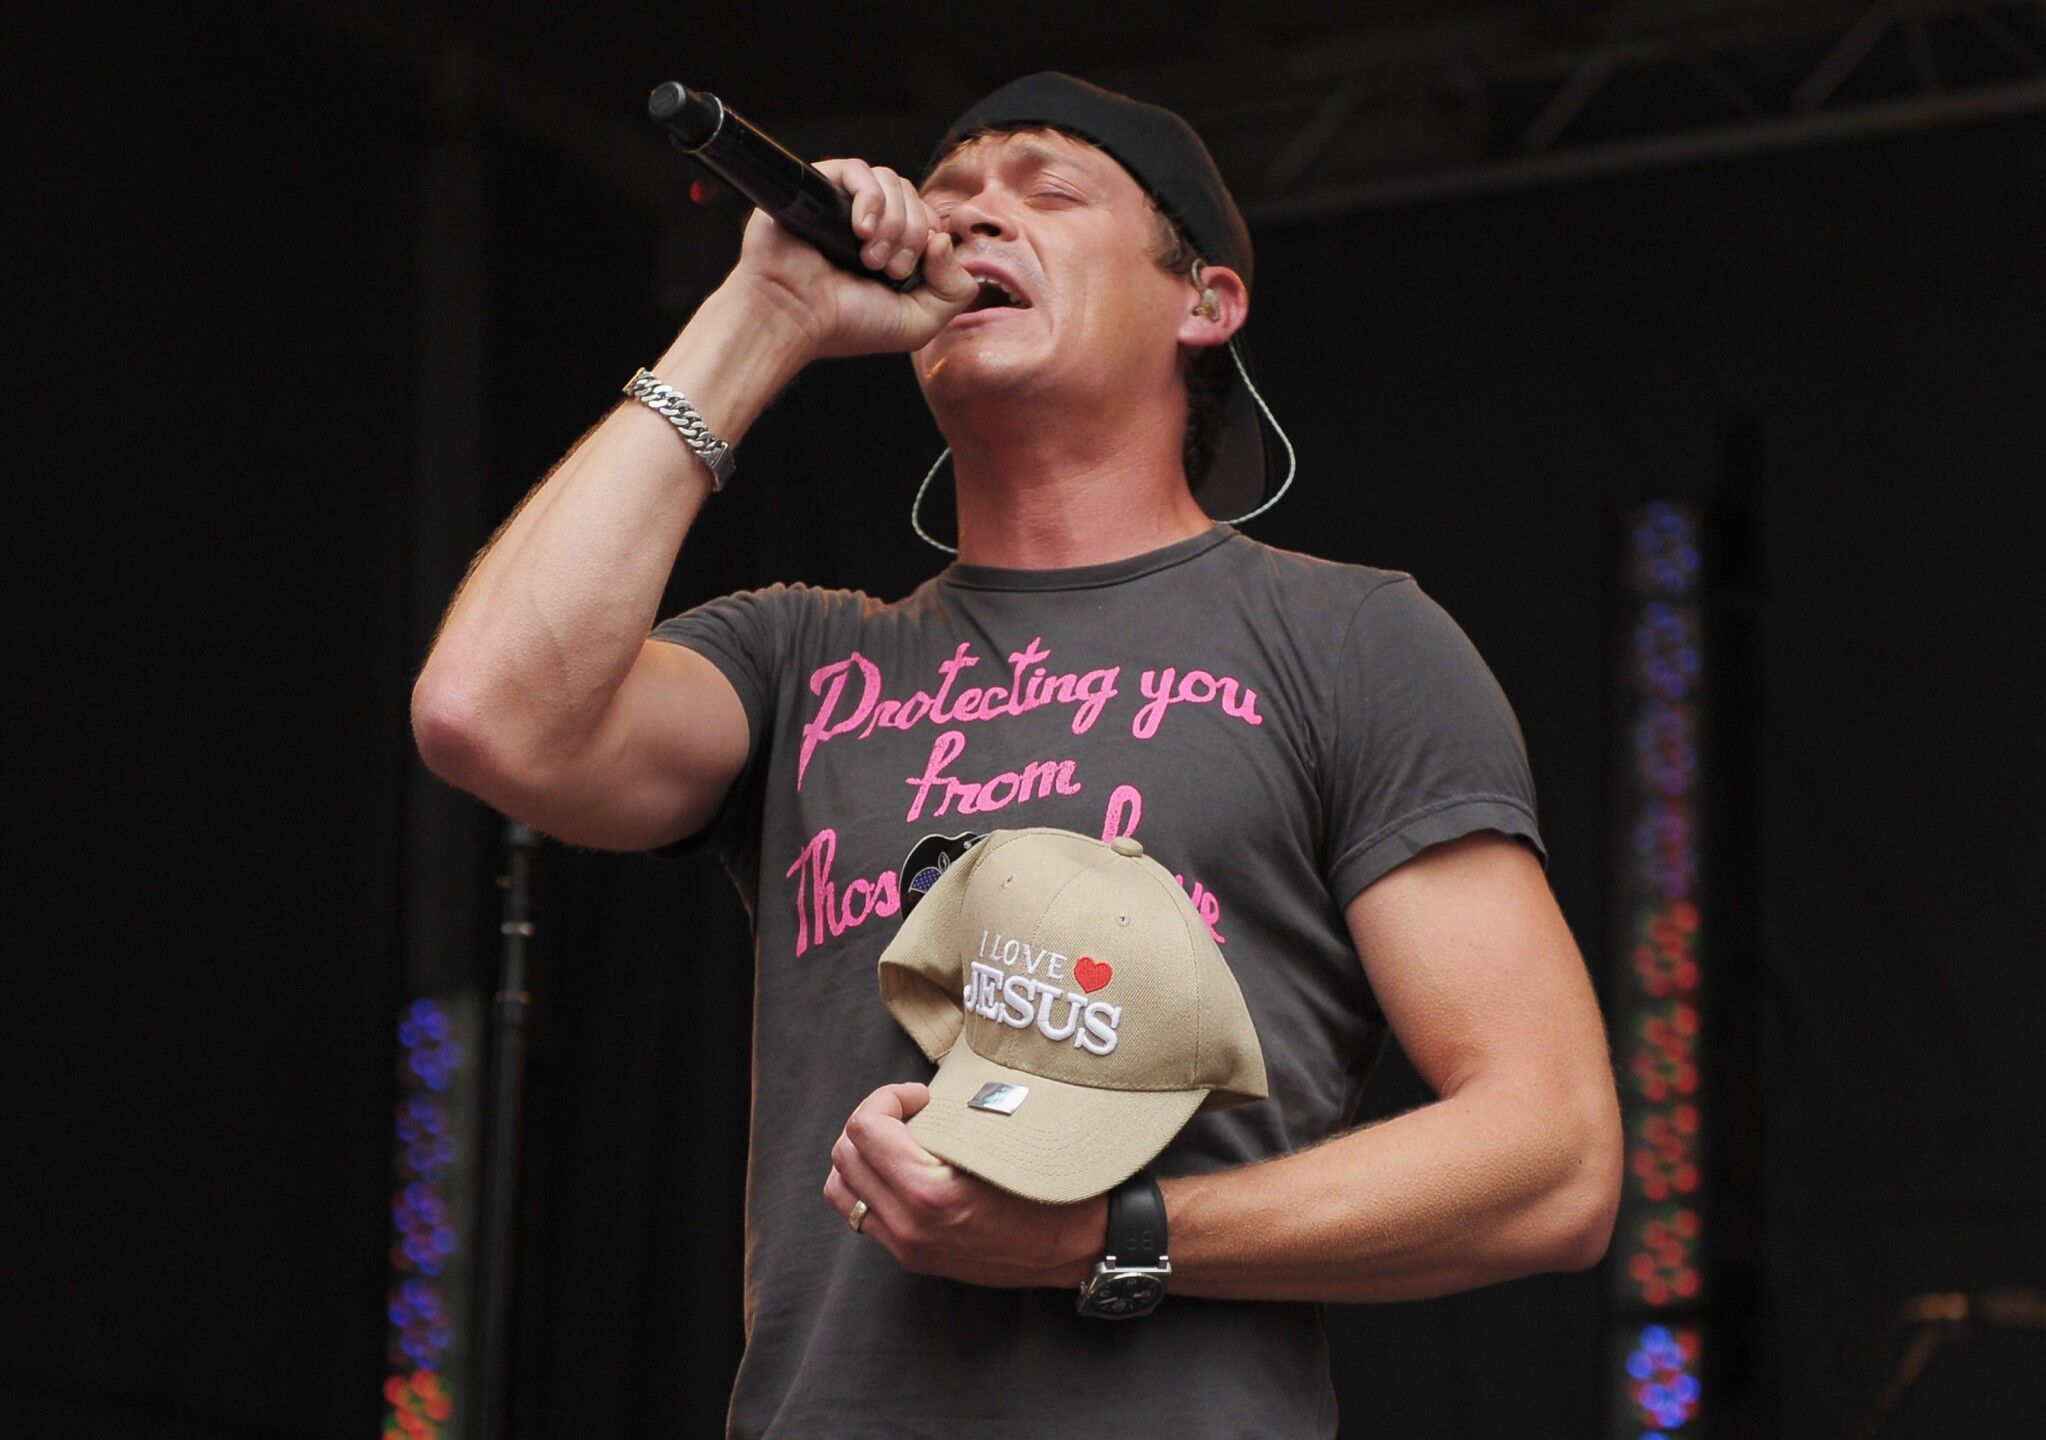 3 Doors Down will perform June 30 at Summerfest